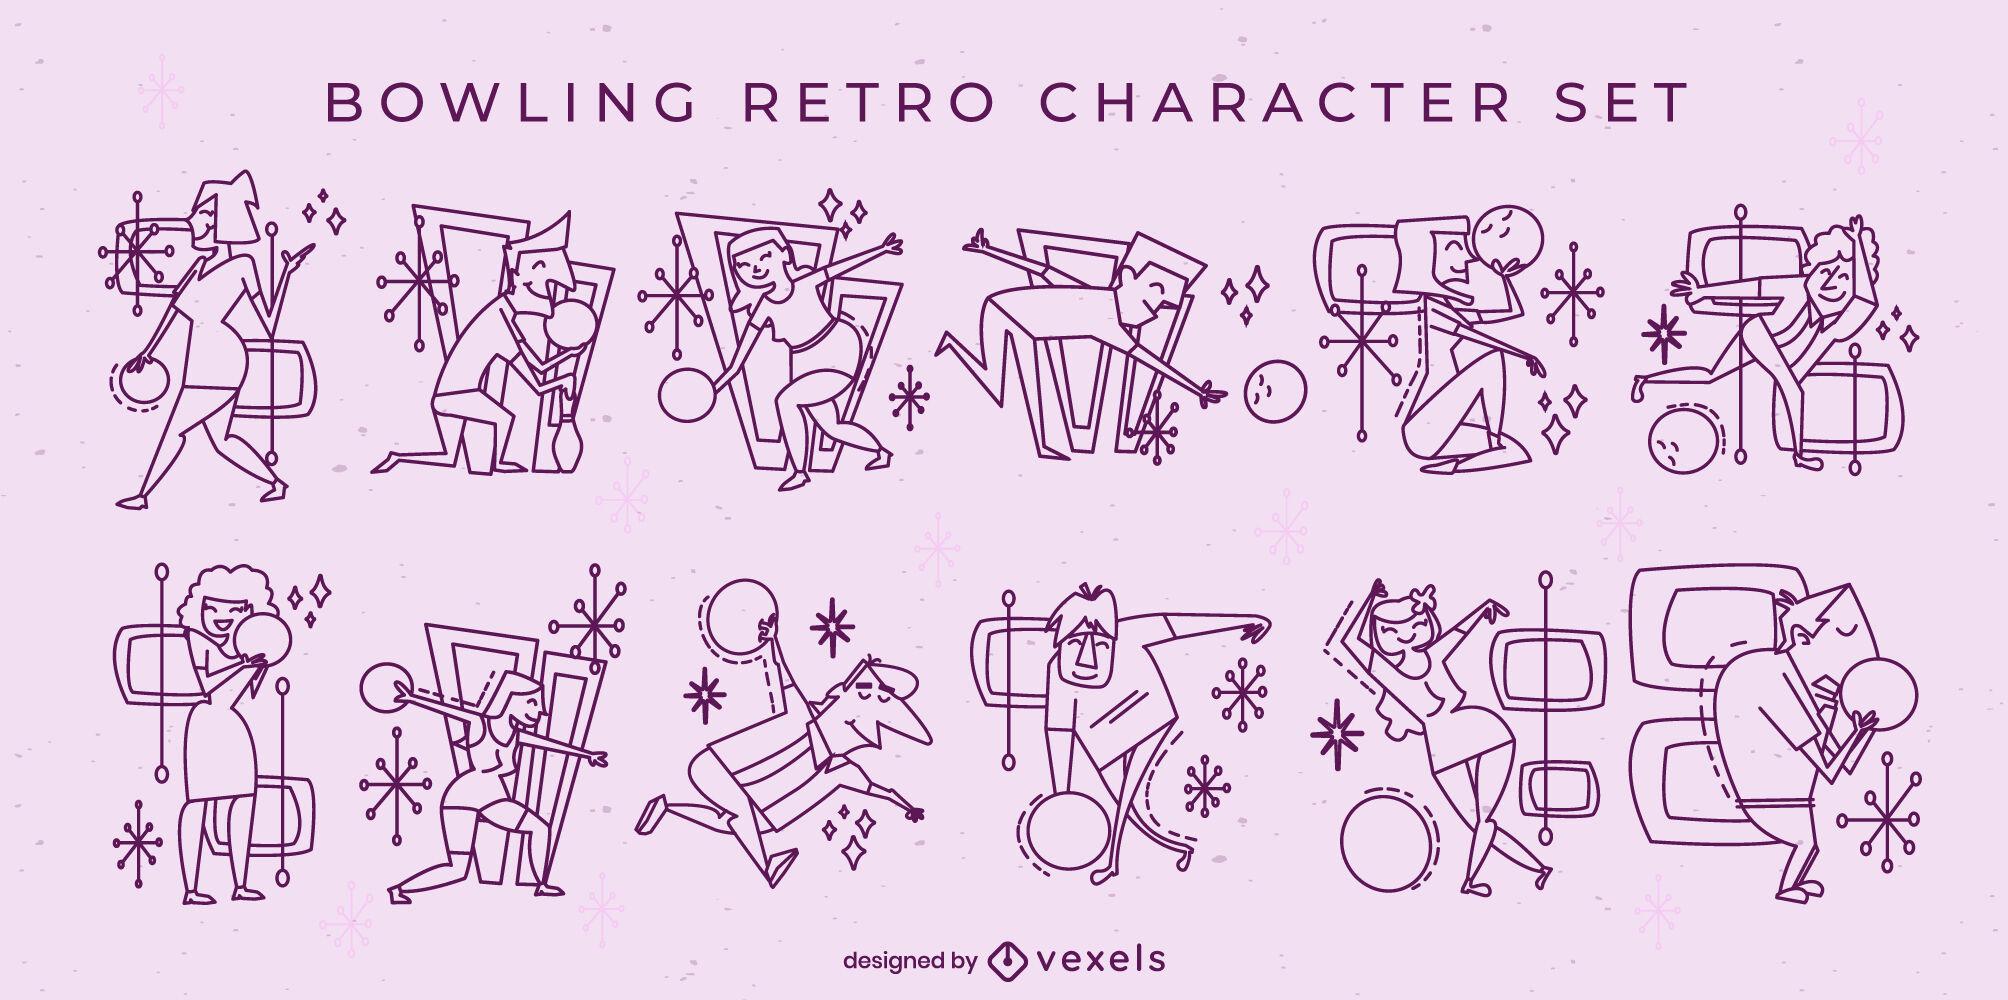 Bowling characters retro cartoon set